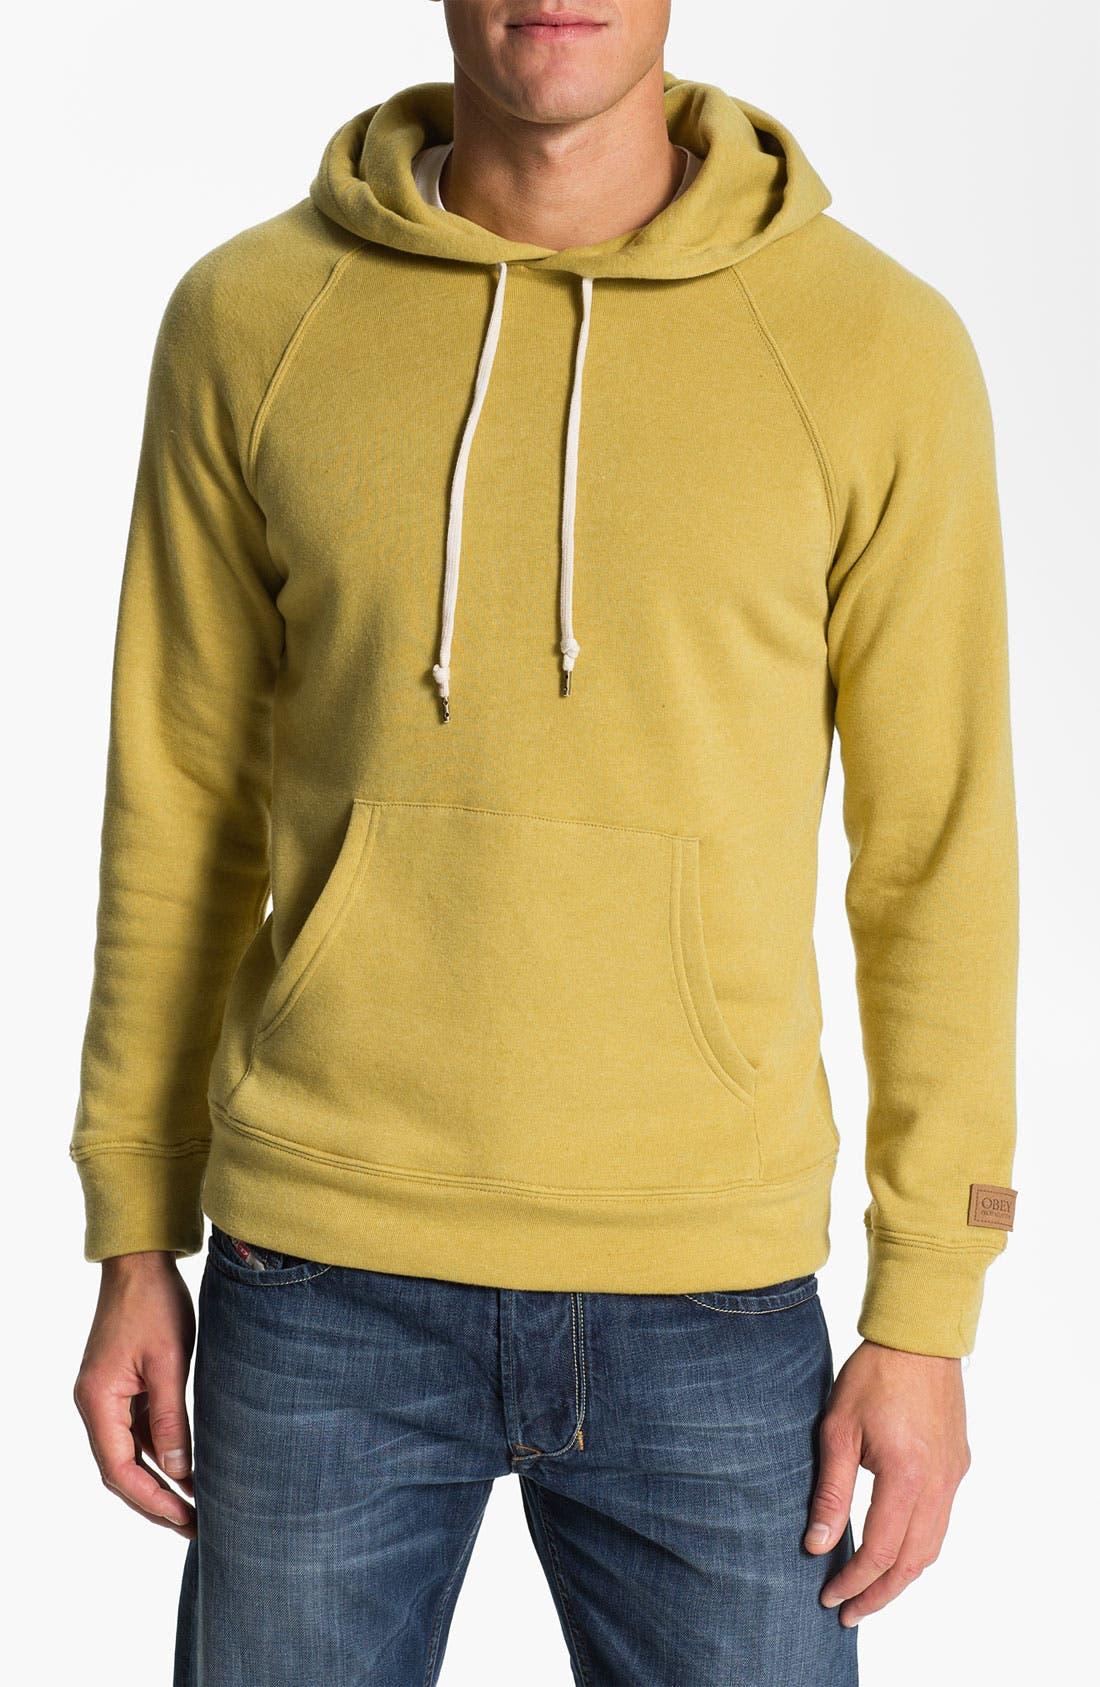 Main Image - Obey 'Lofty Creature Comforts' Hooded Sweatshirt